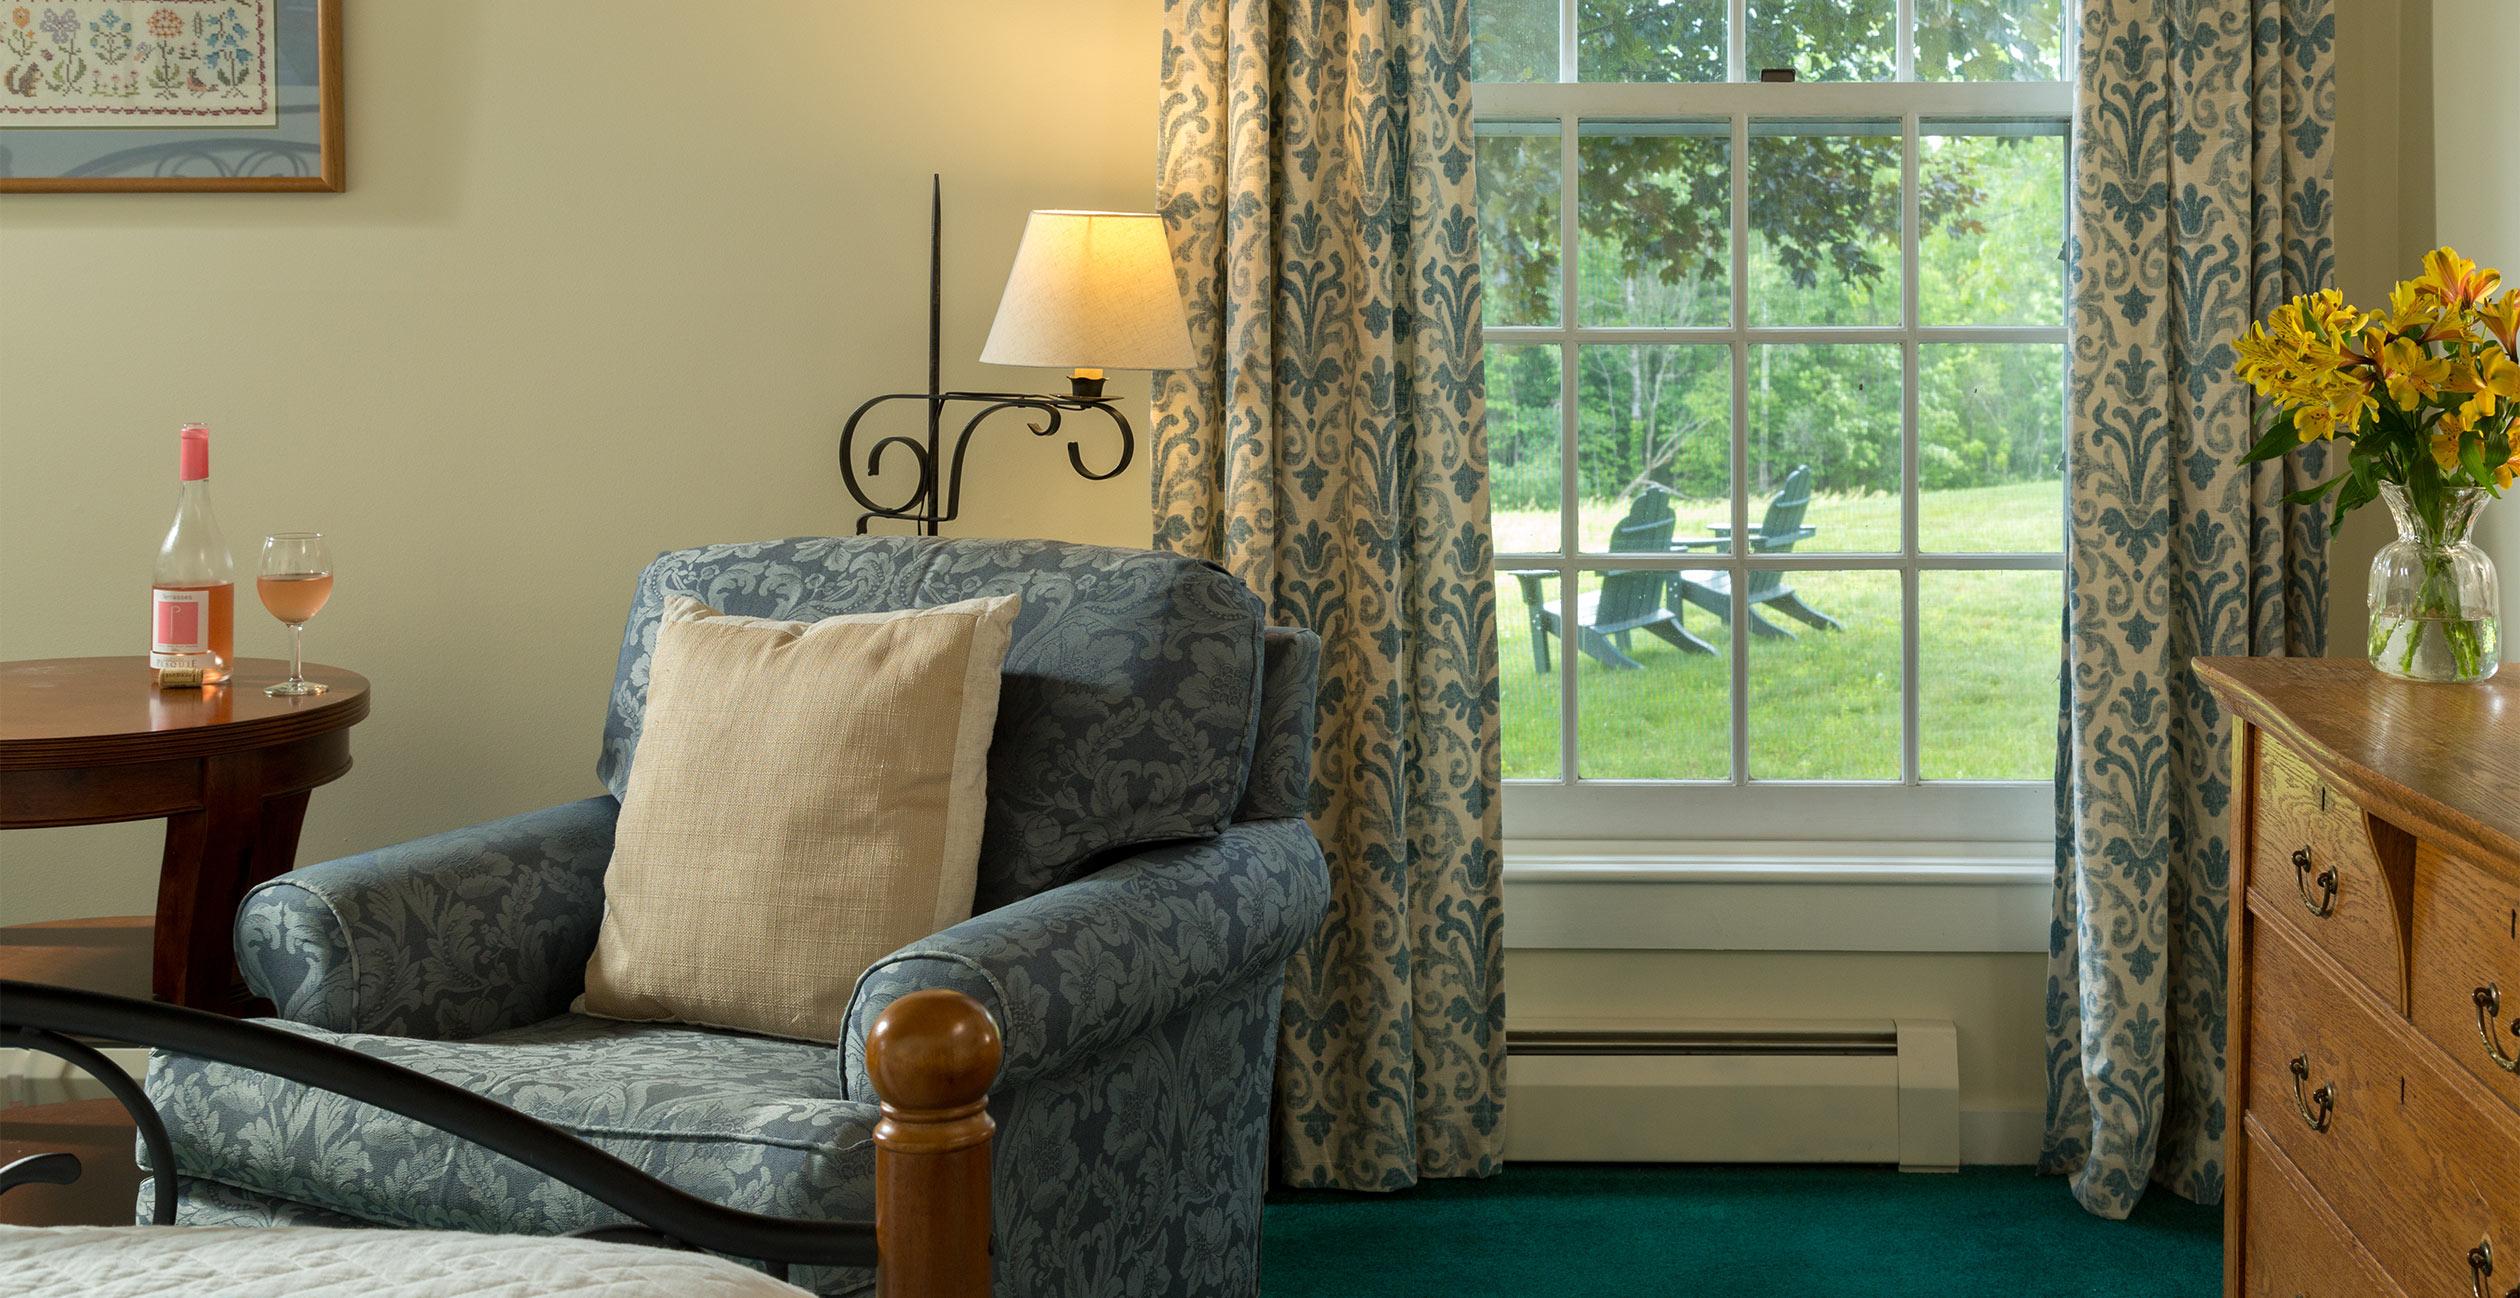 View of back yard through large window